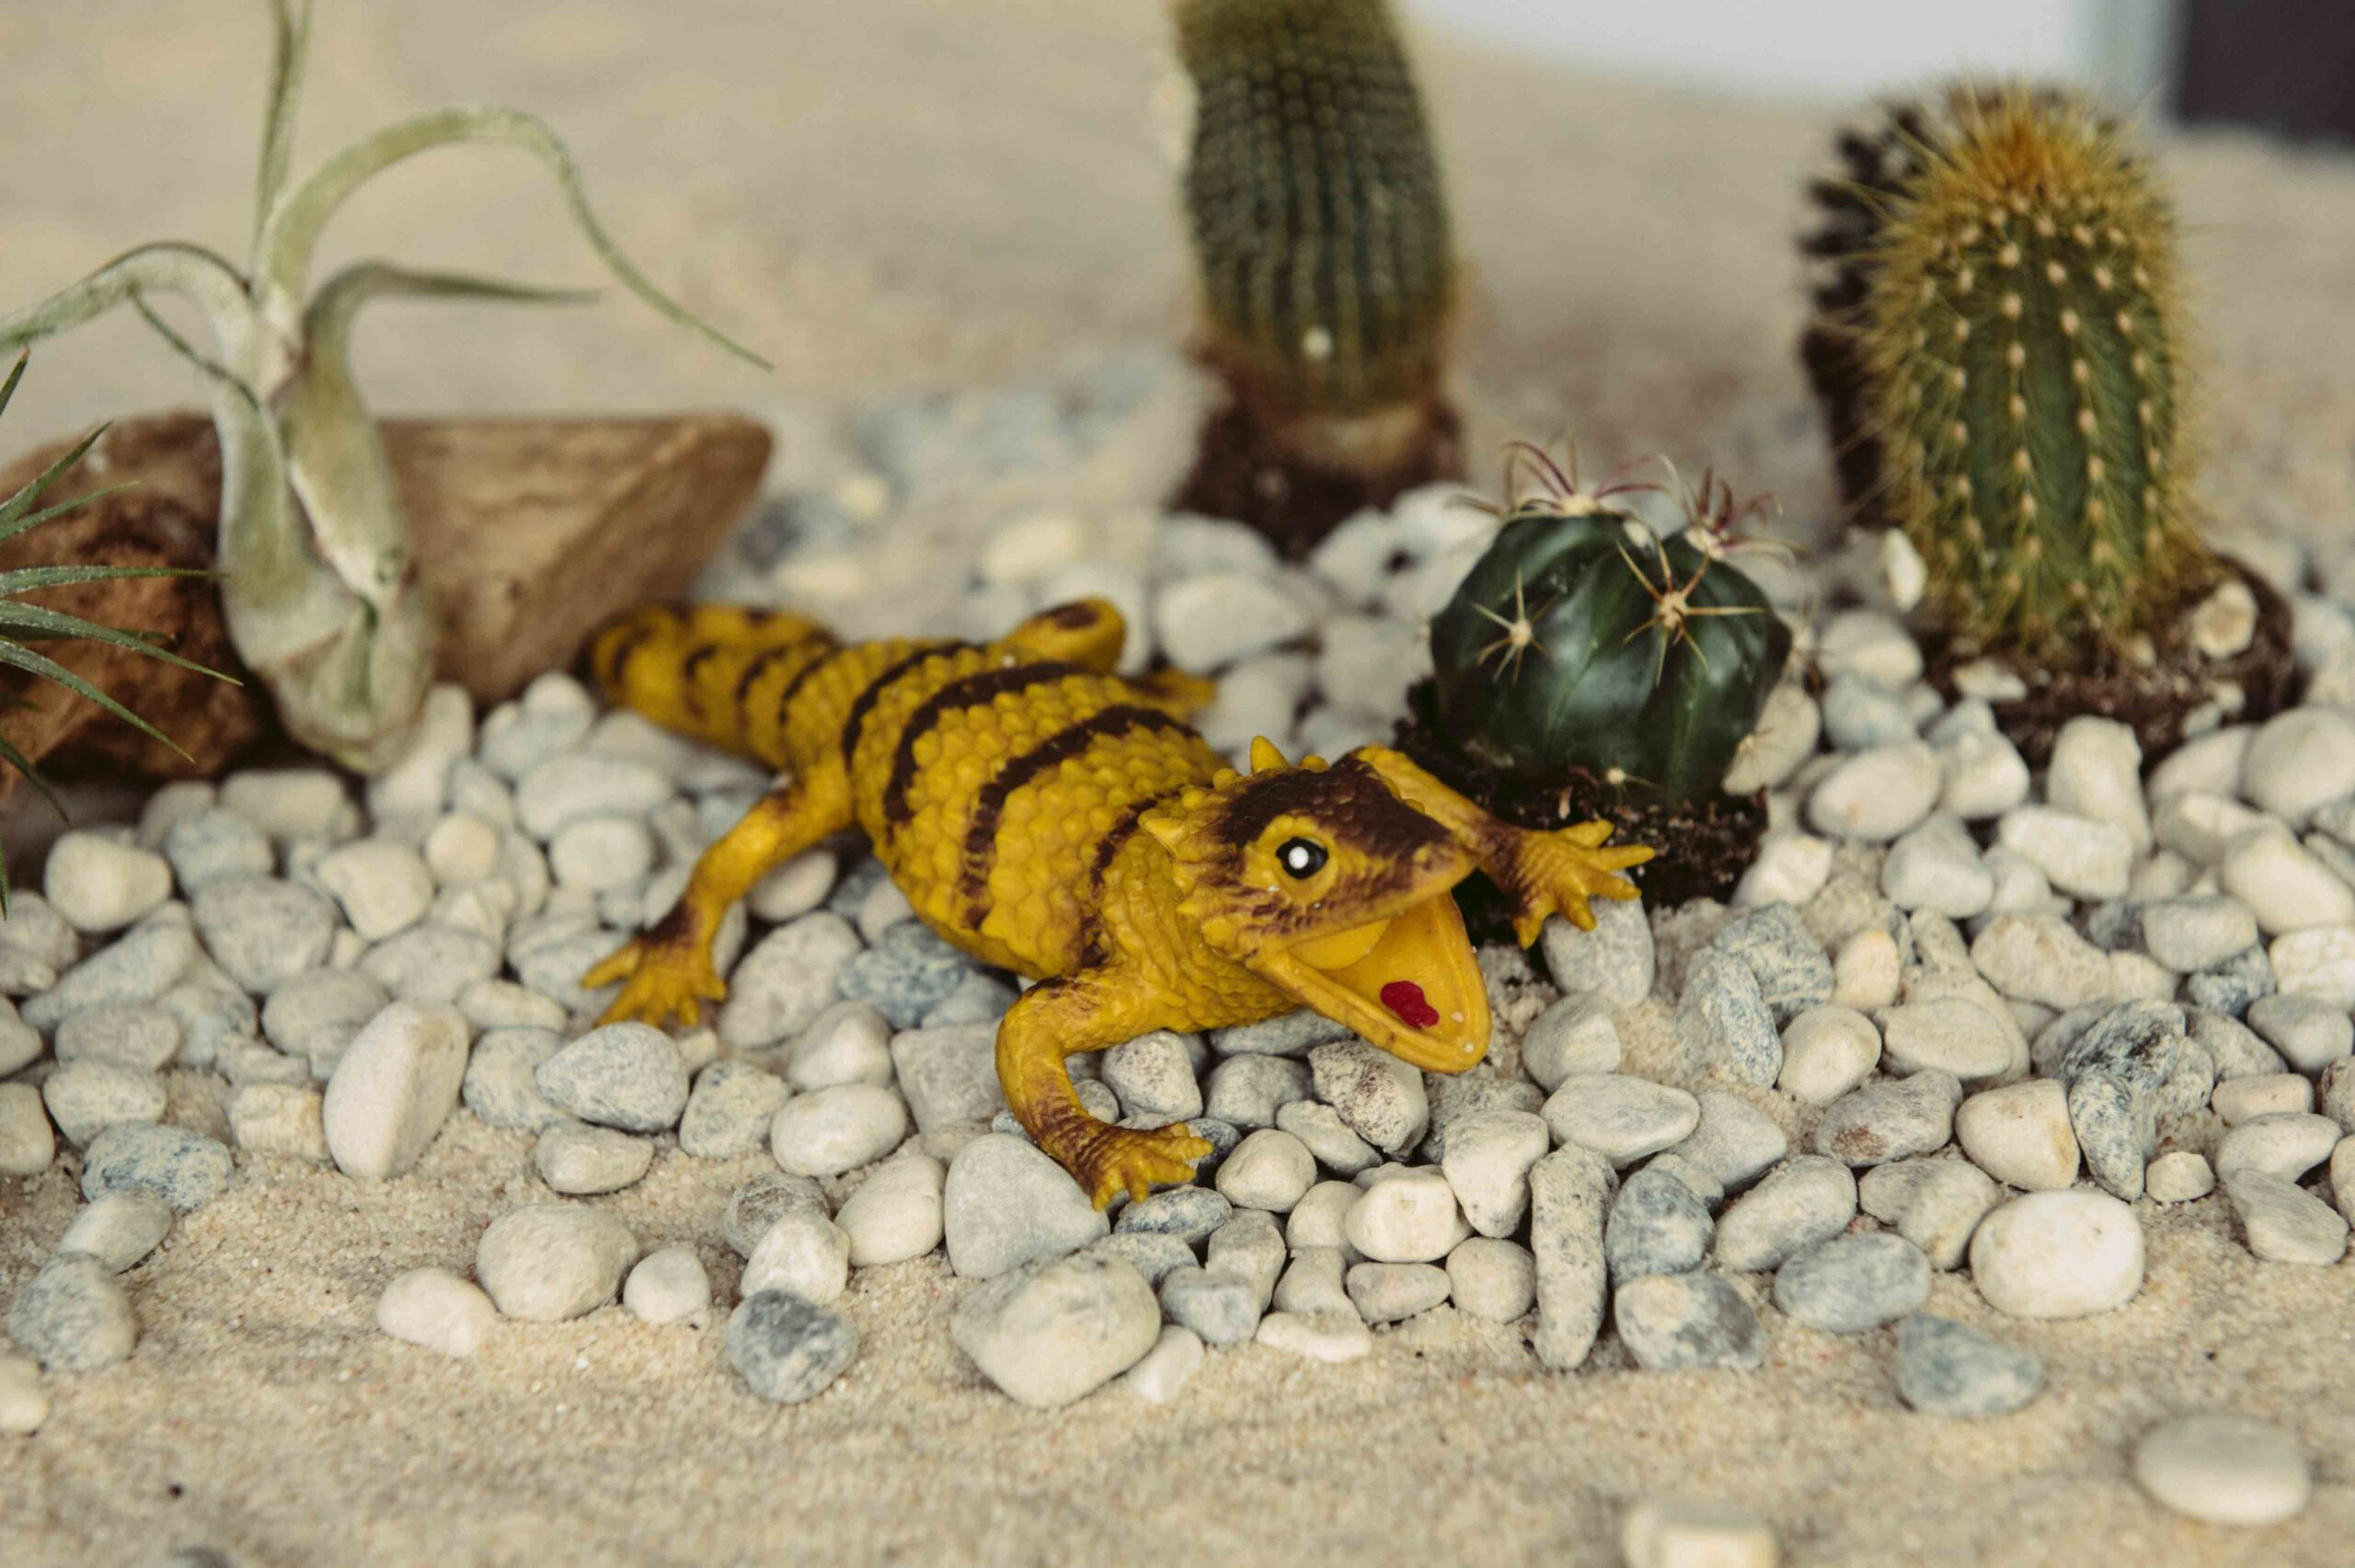 Sungazed Lizard: lucertola giallobruna rivestita da placche appuntite